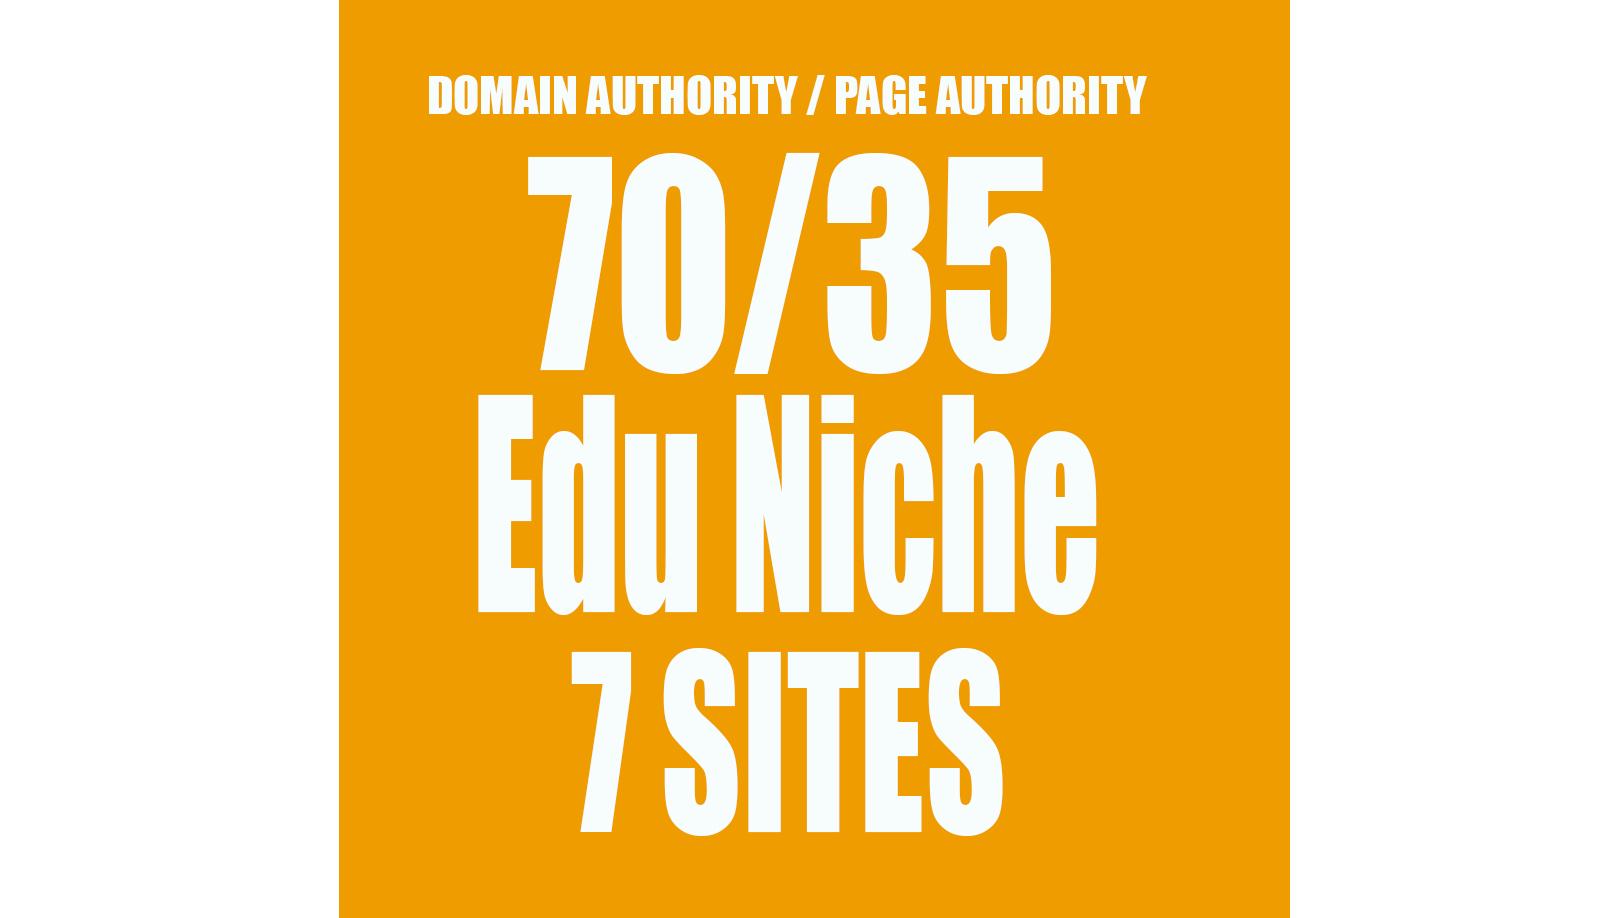 Permanent blogroll 7 sites DA70 EDUCATION CATEGORY